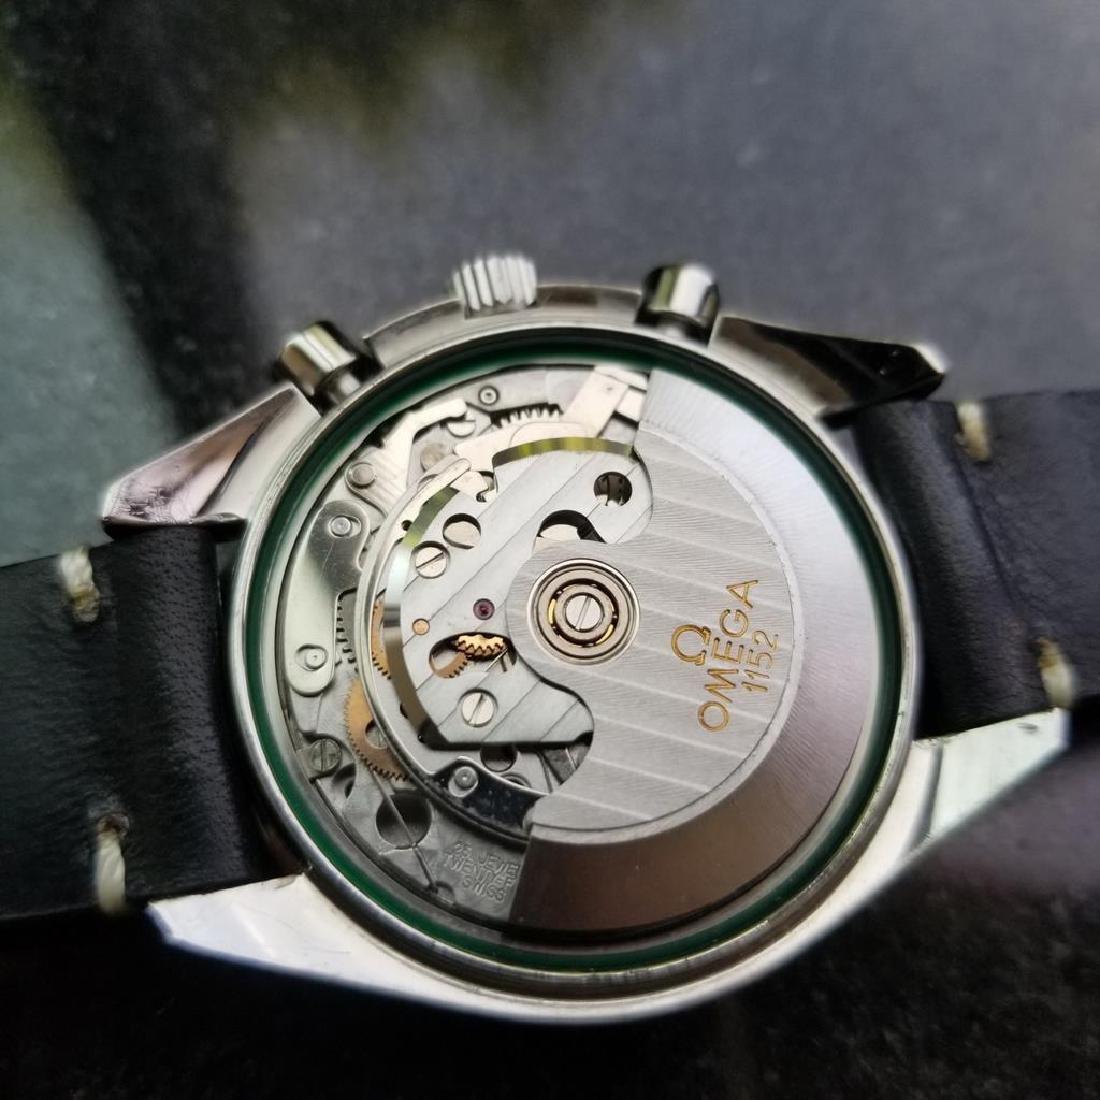 OMEGA Men's Speedmaster Automatic Chronograph 175.0083 - 9